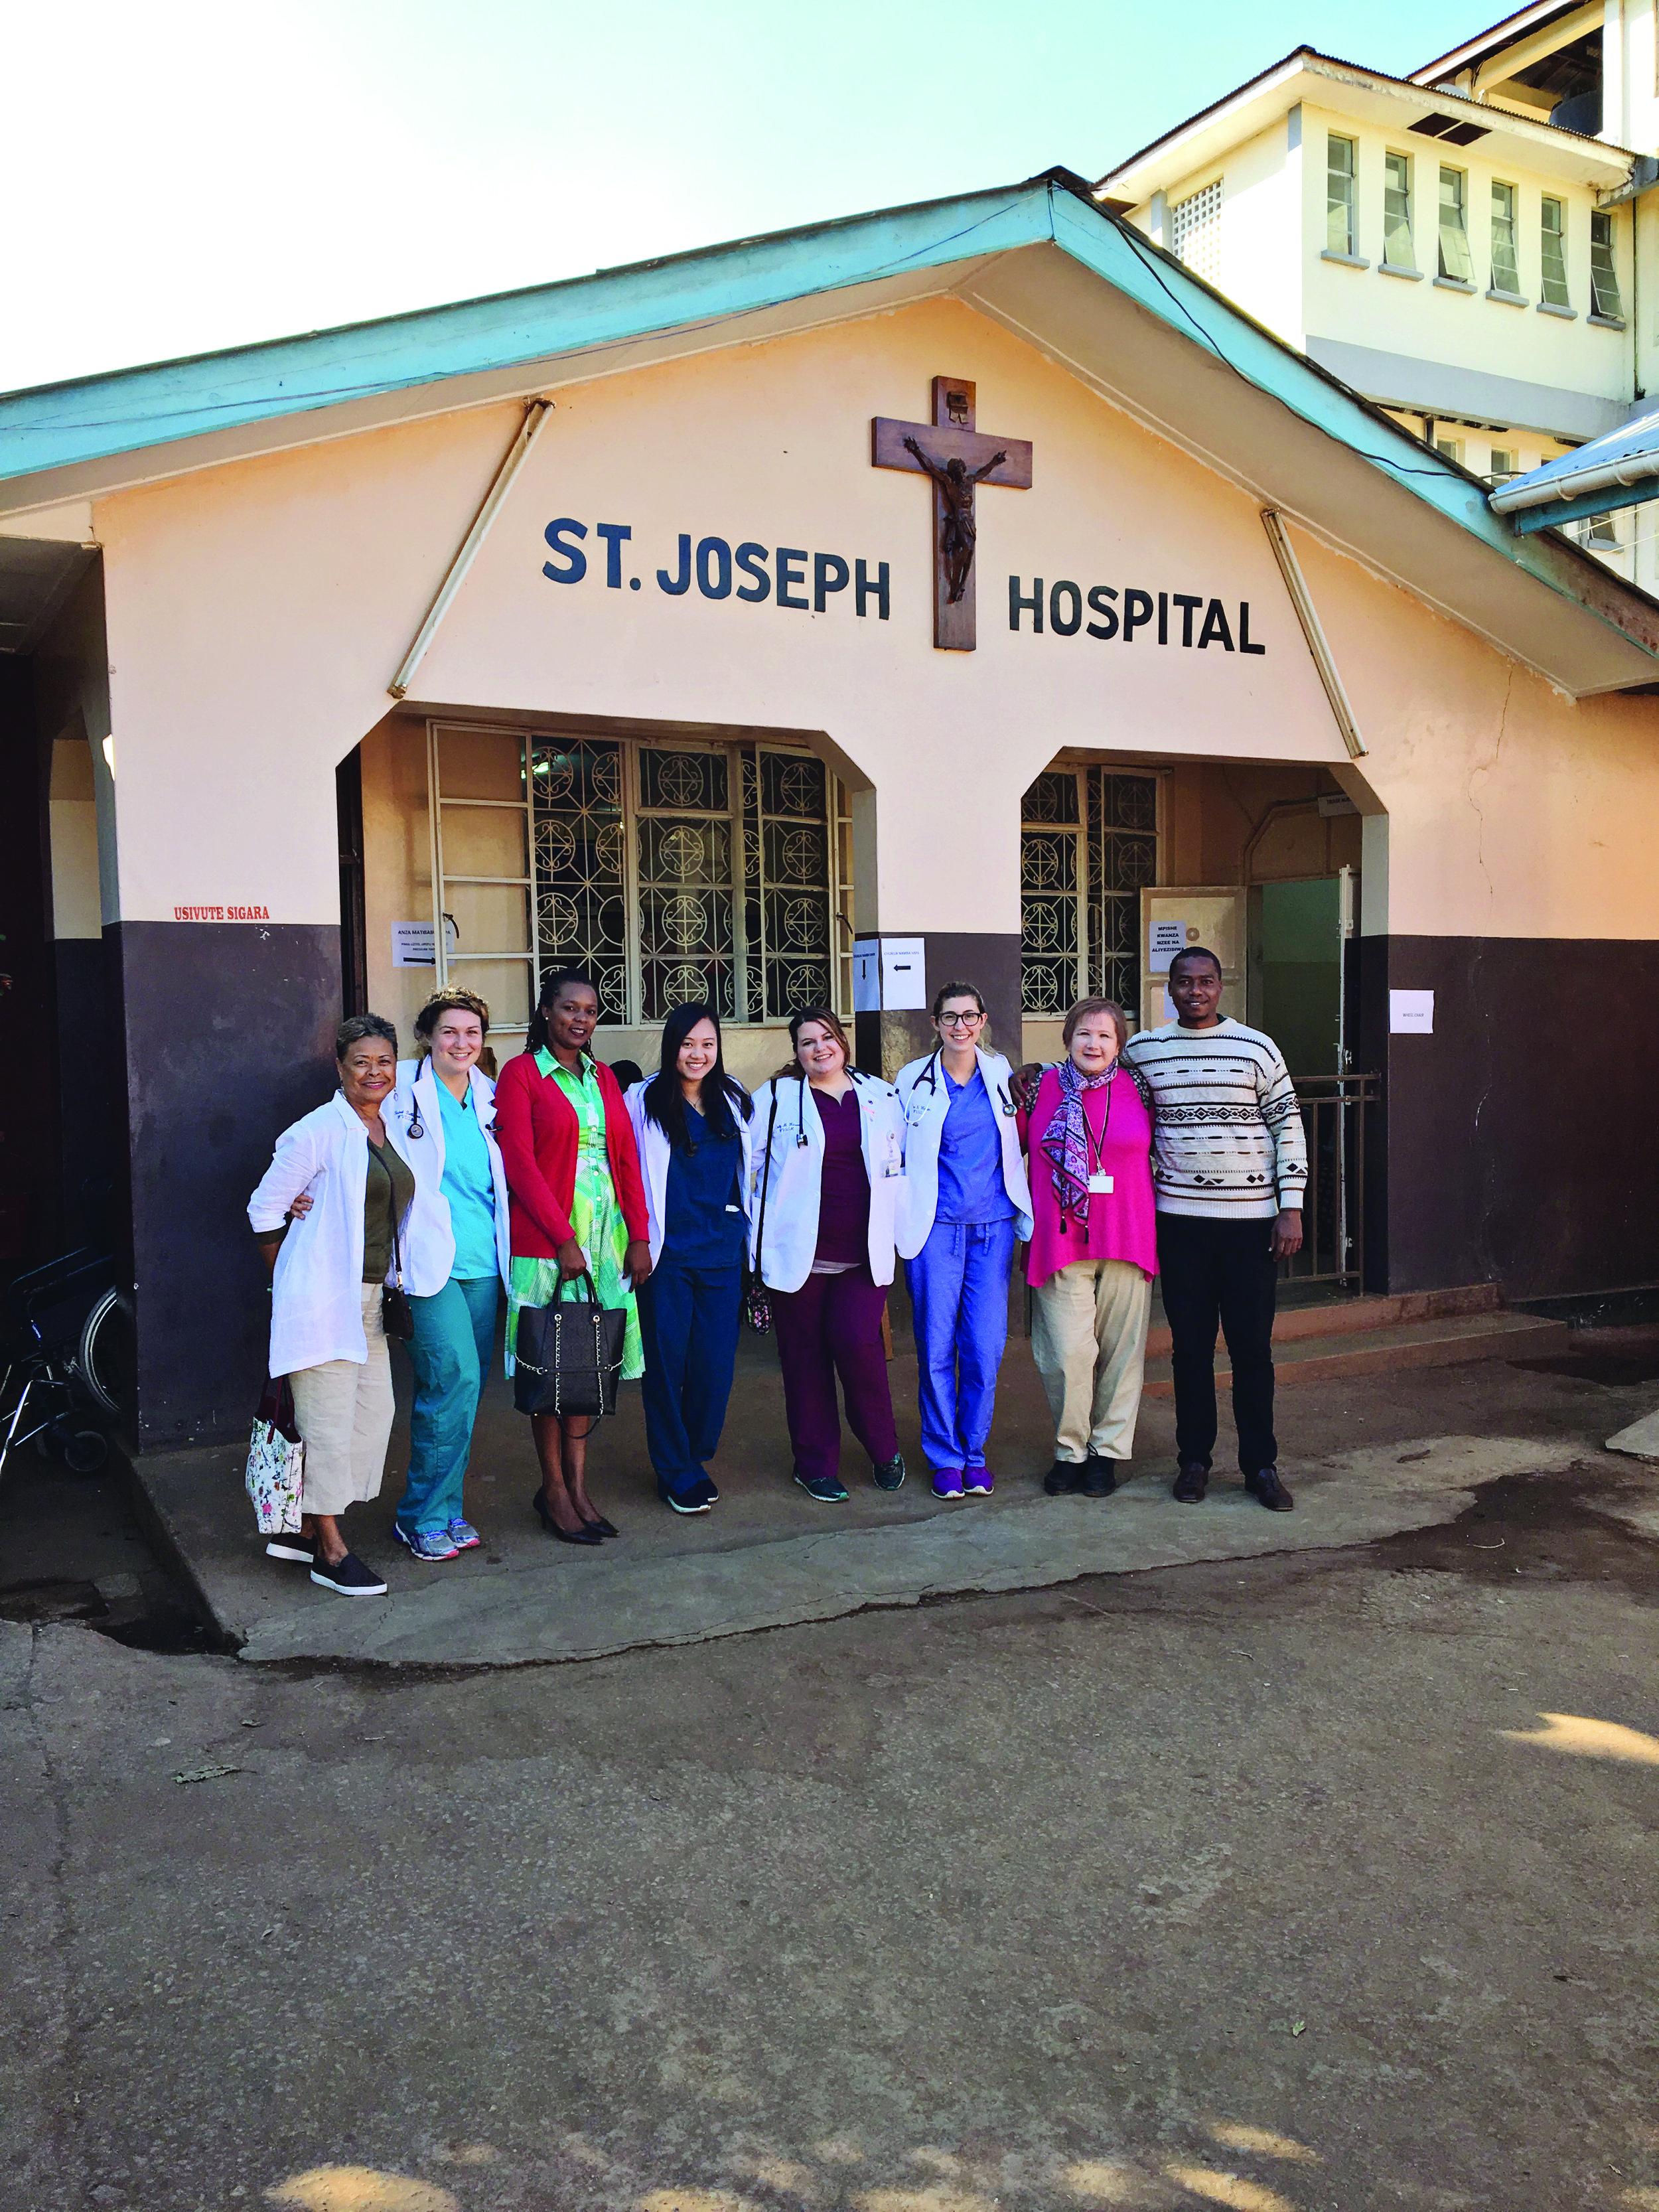 The WVSOM Team with Dr Geophrey Mboye at St. Joseph Hospital